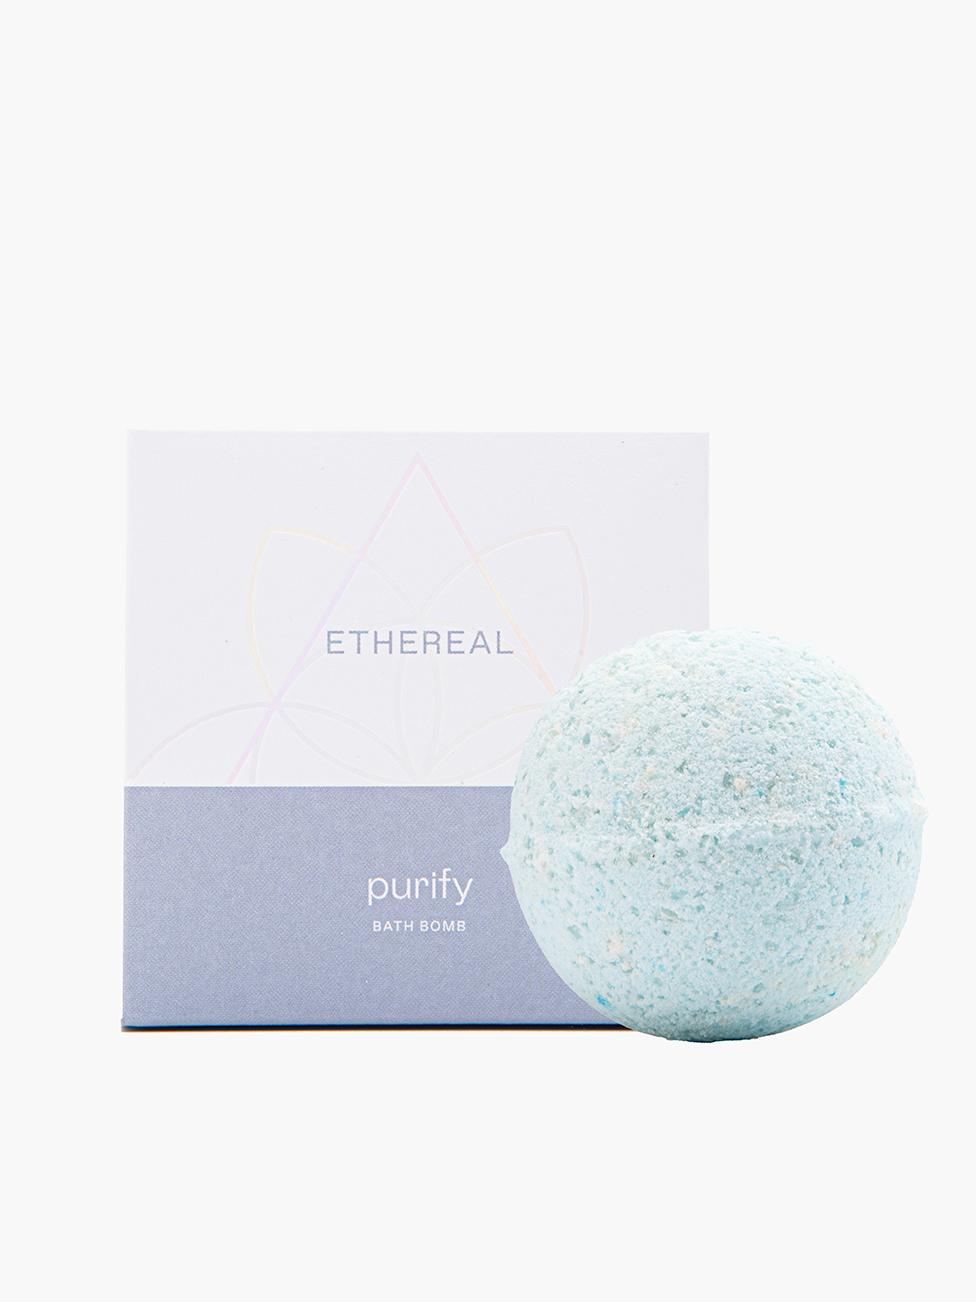 Purify_Bathbomb_Package_Ethereal_Dermocosmetics_Skincare_Handmade_Greek_Products